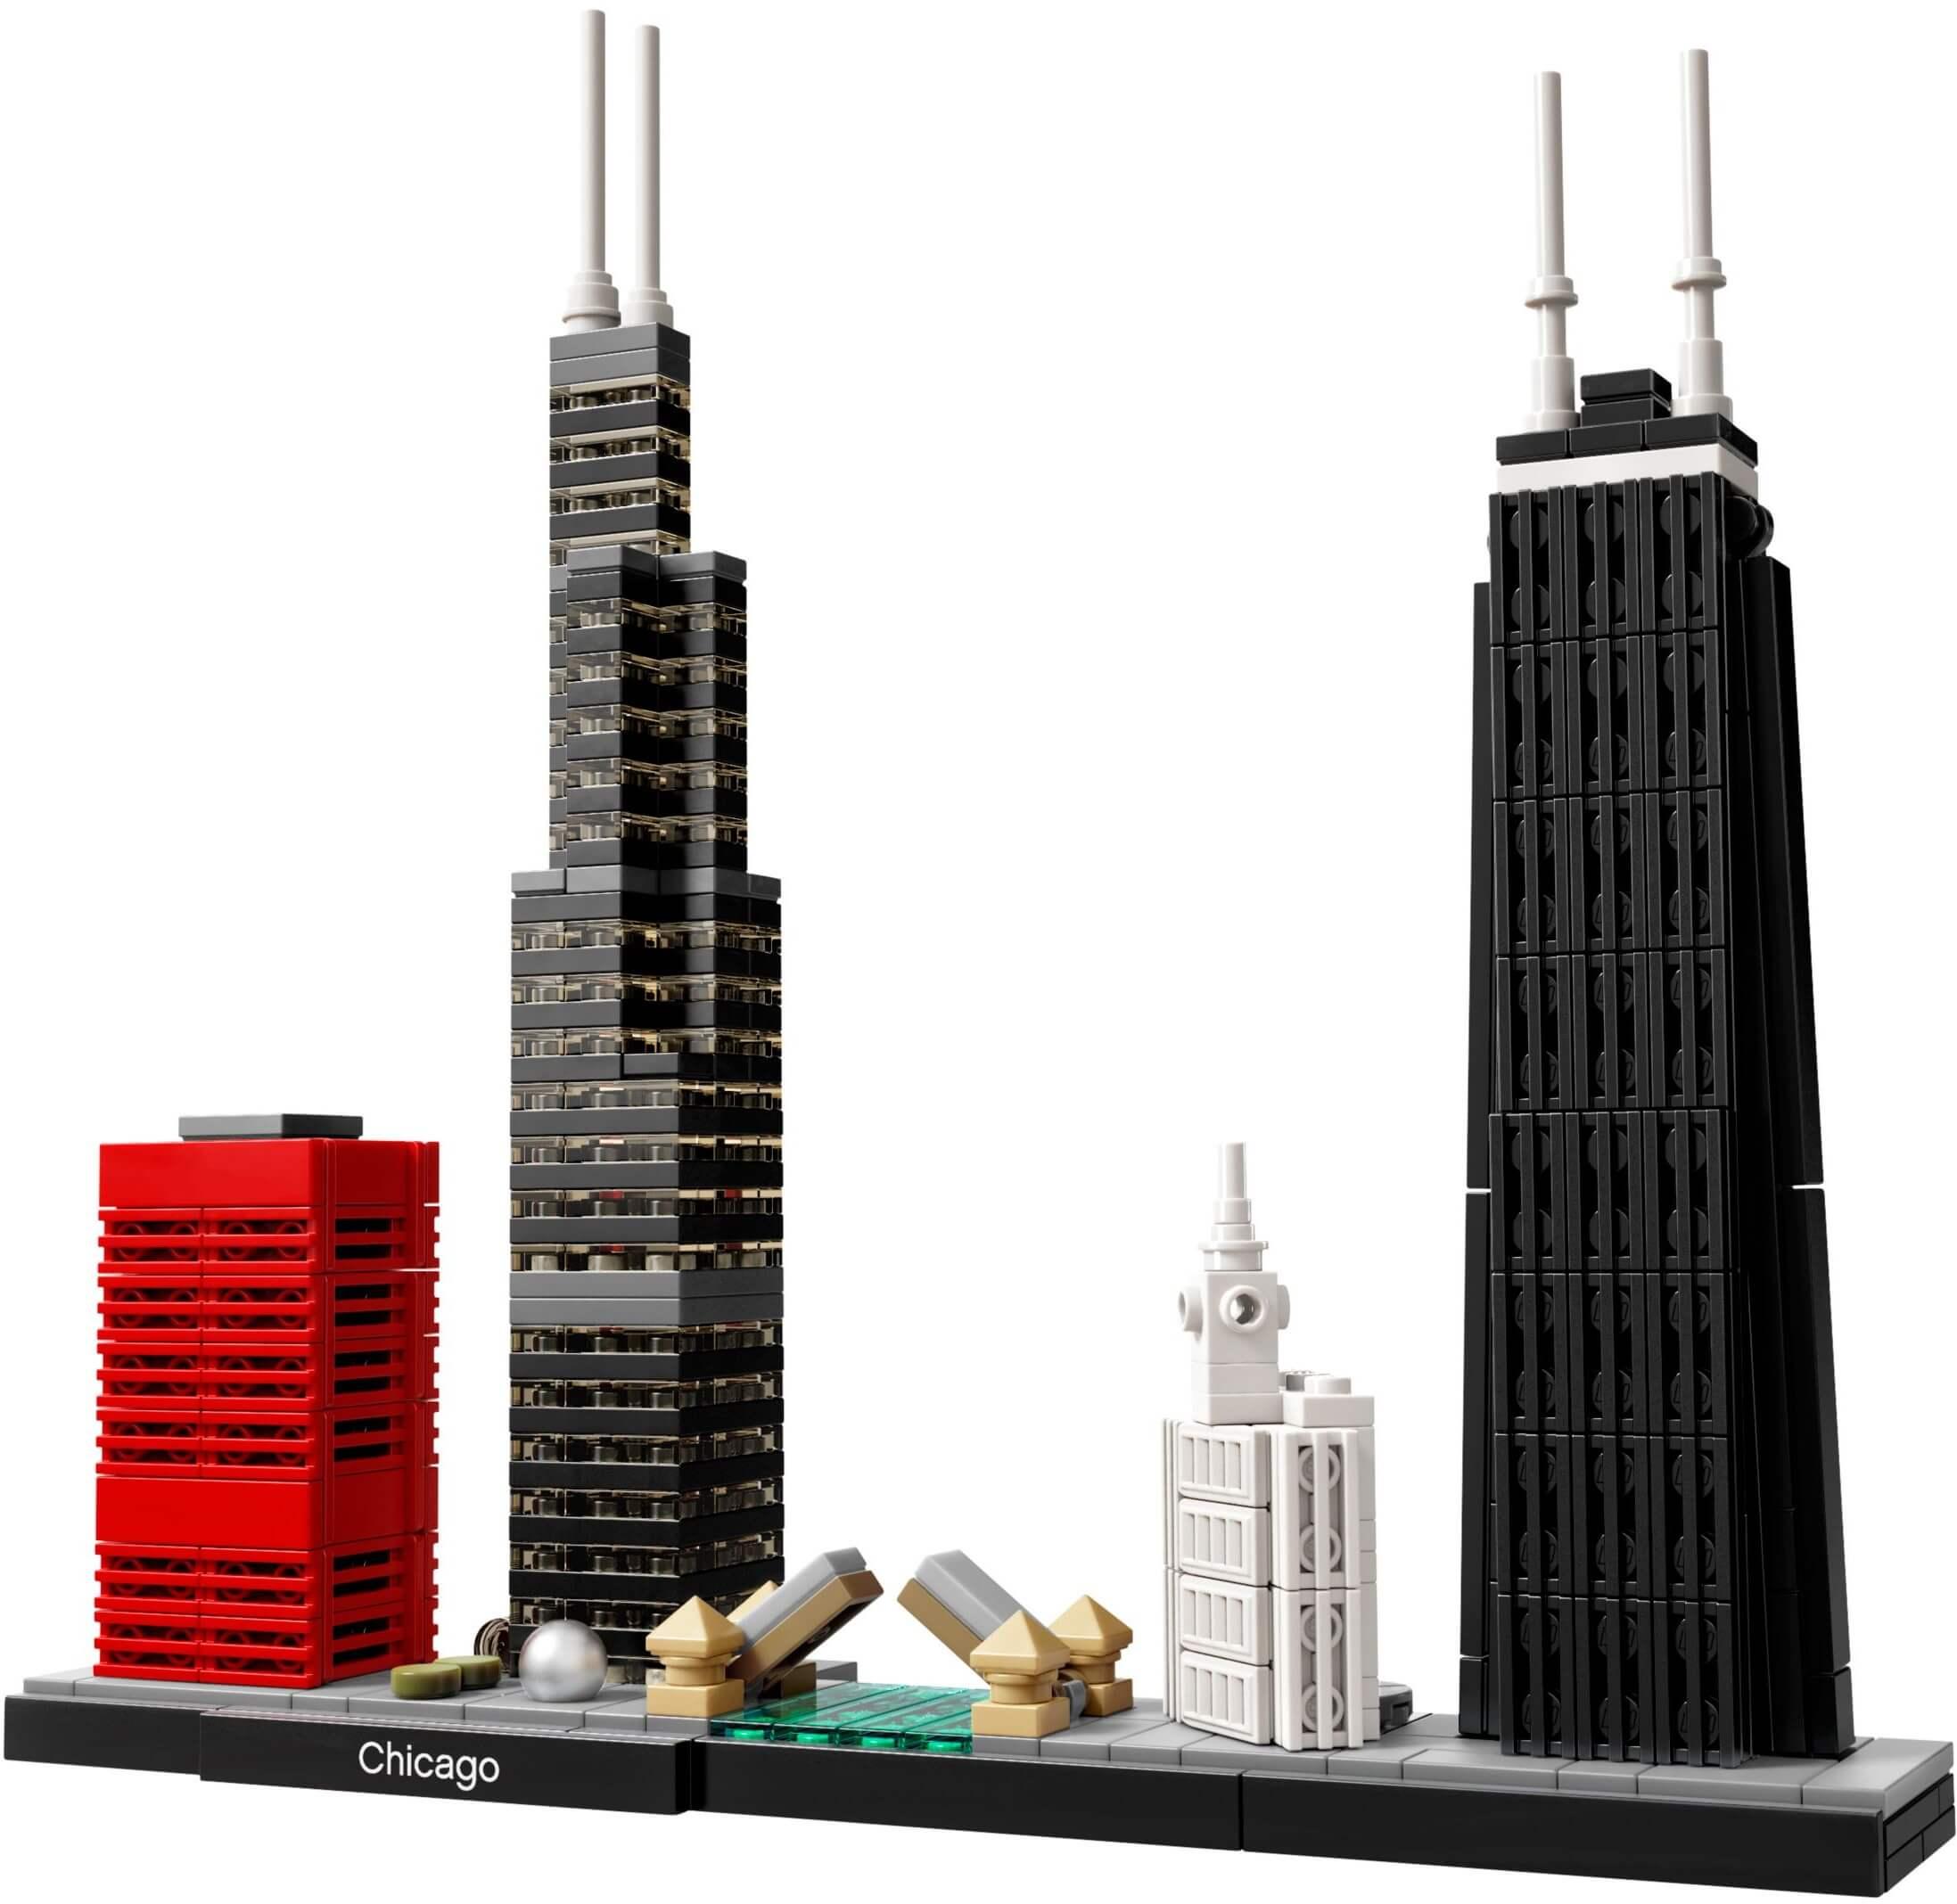 Mua đồ chơi LEGO 21033 - LEGO Architecture 21033 - Thành Phố Chicago (LEGO 21033 Chicago)